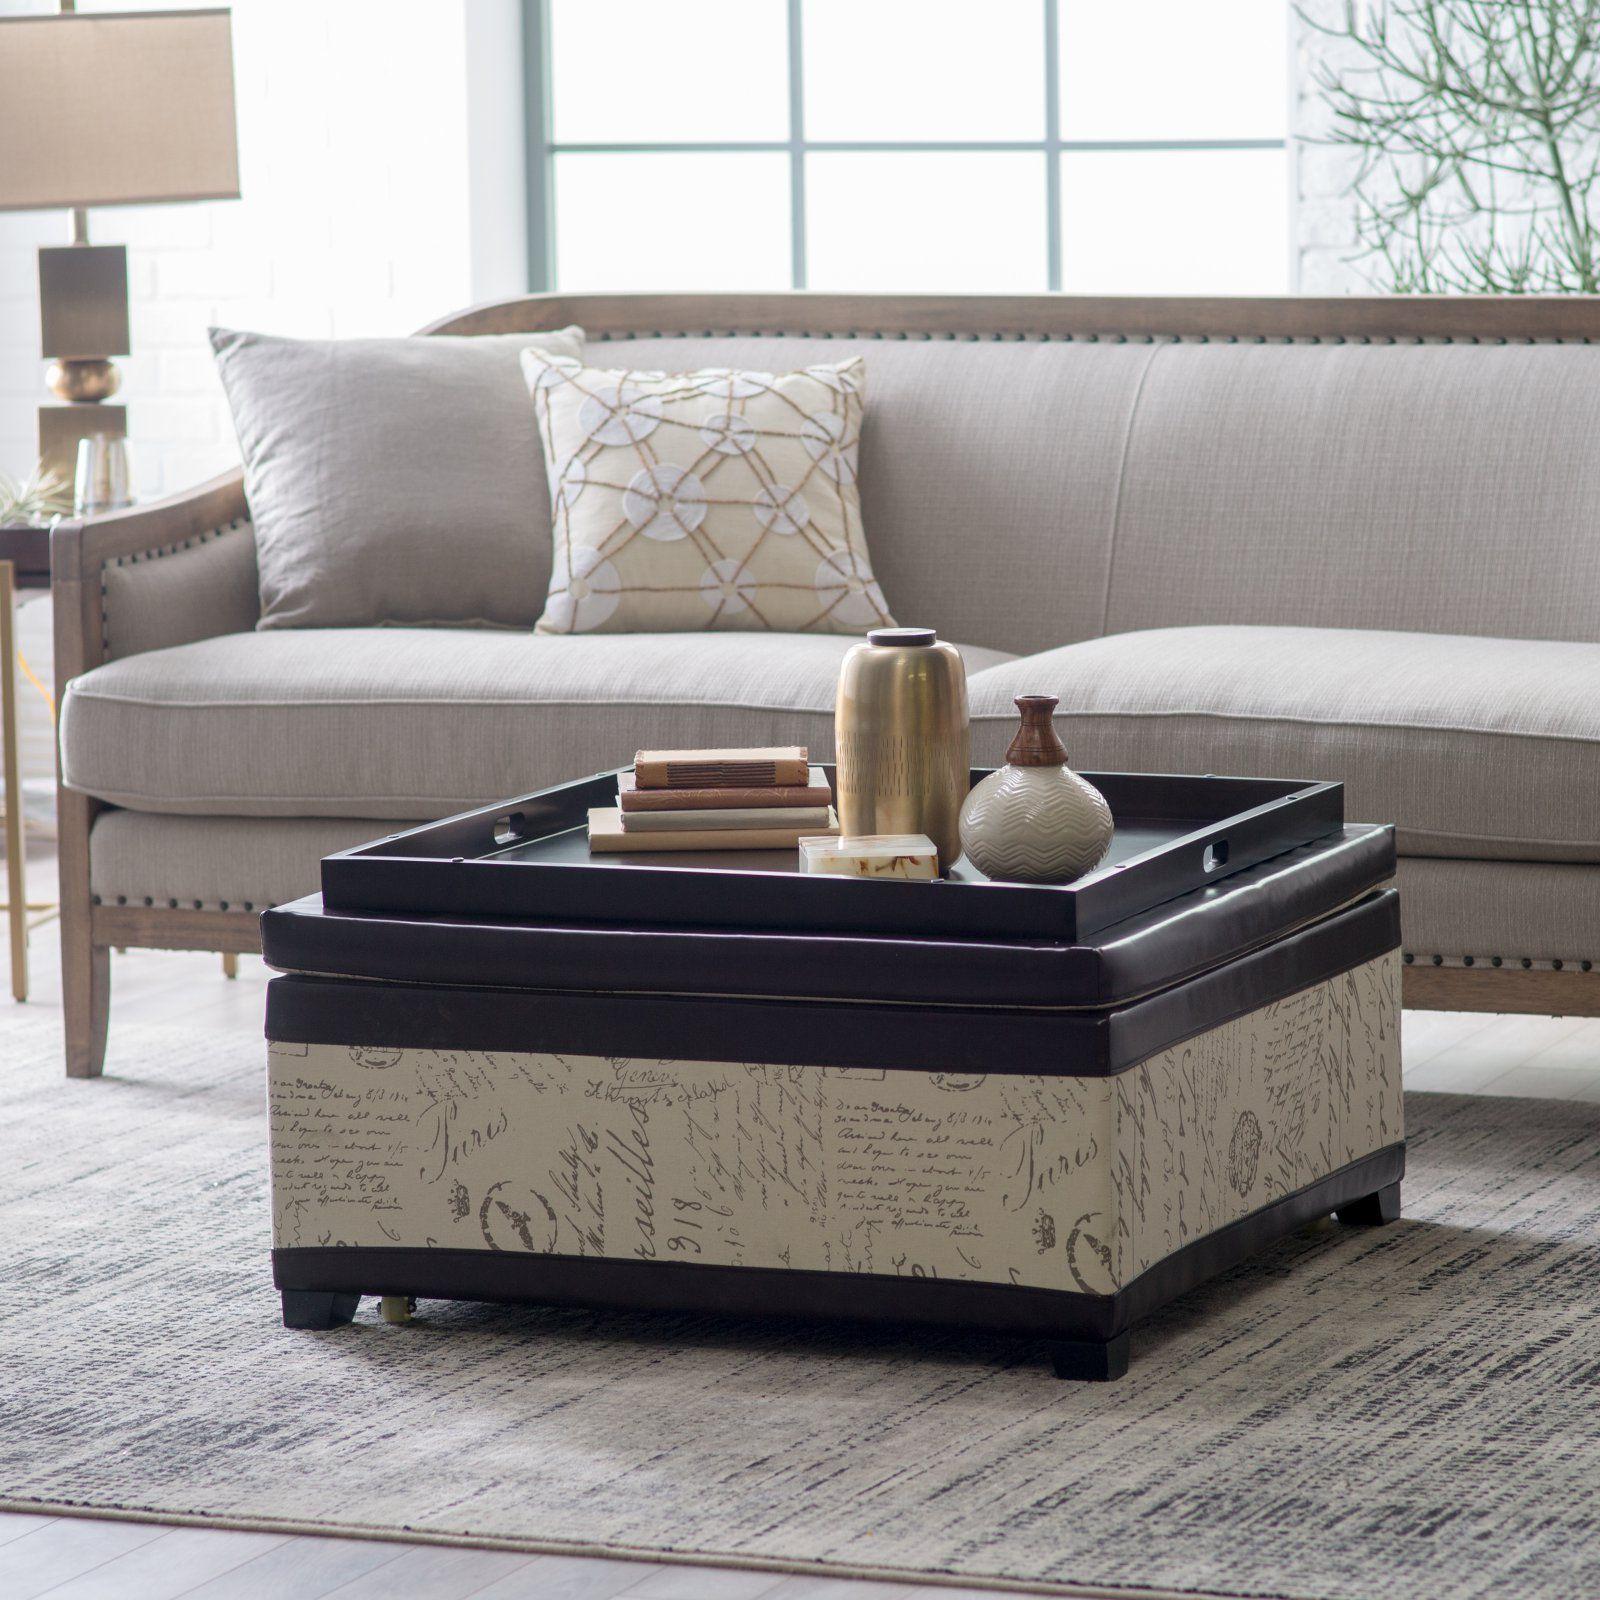 belham living corbett leather and linen coffee table storage ottoman rh pinterest com